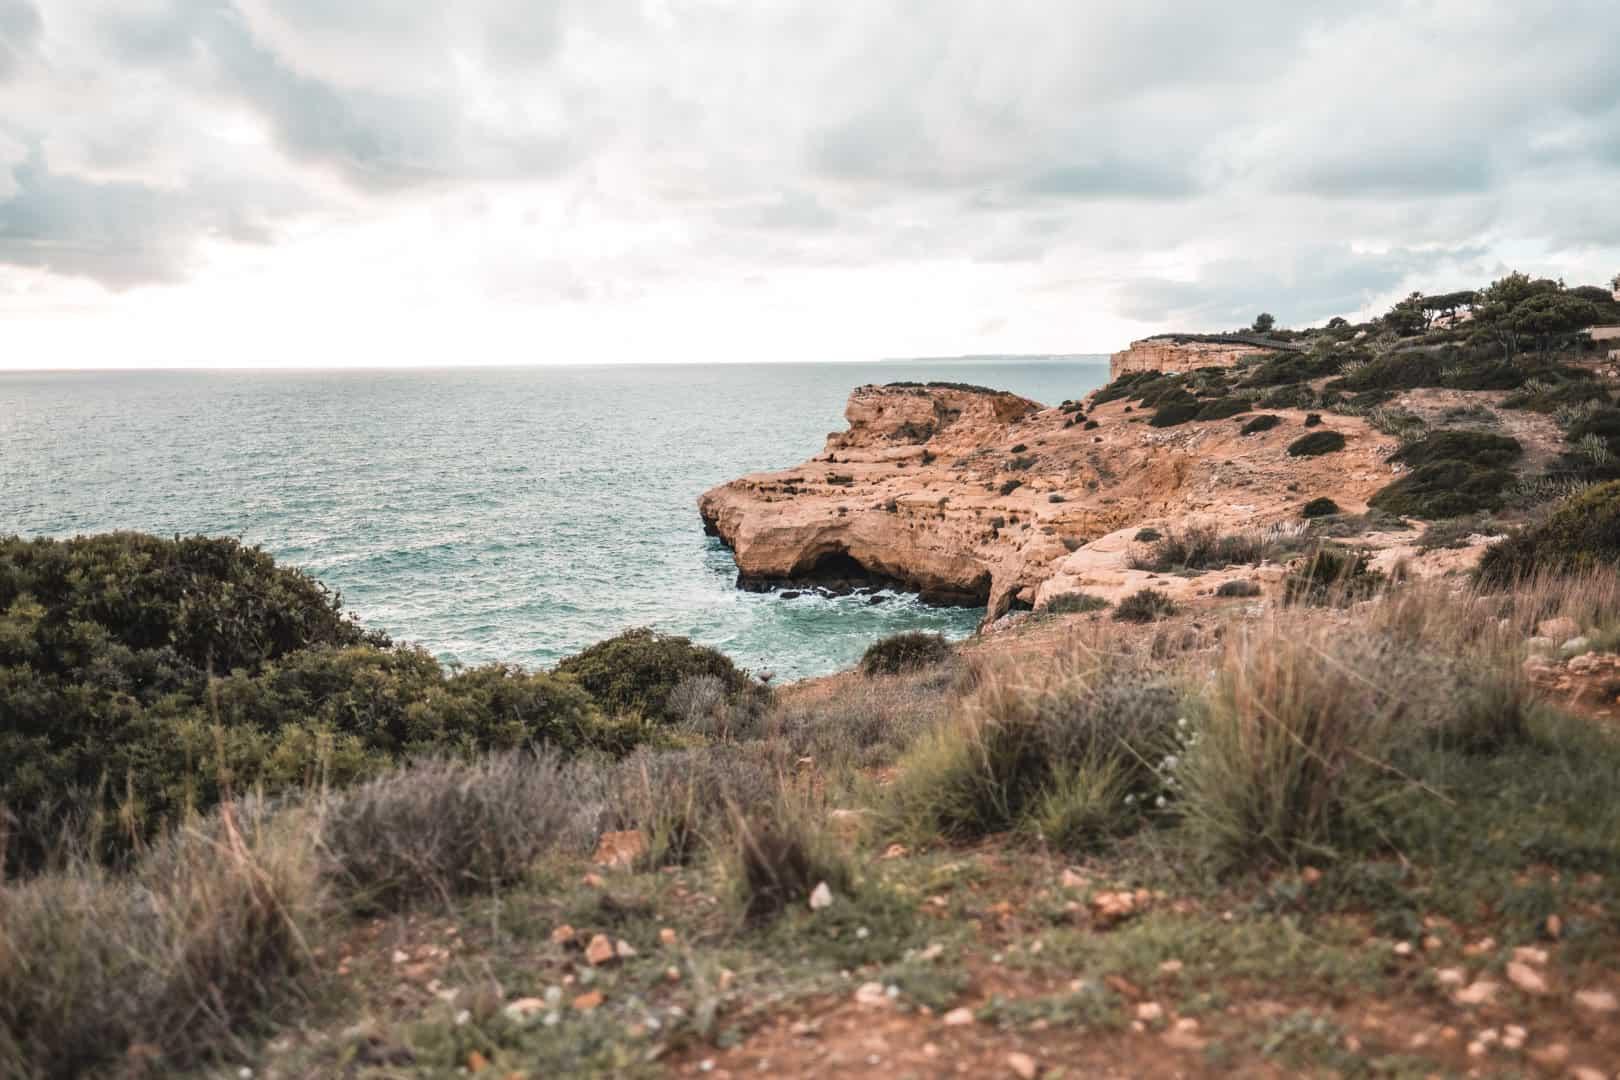 Walking trail from Carvoeiro to Benagil